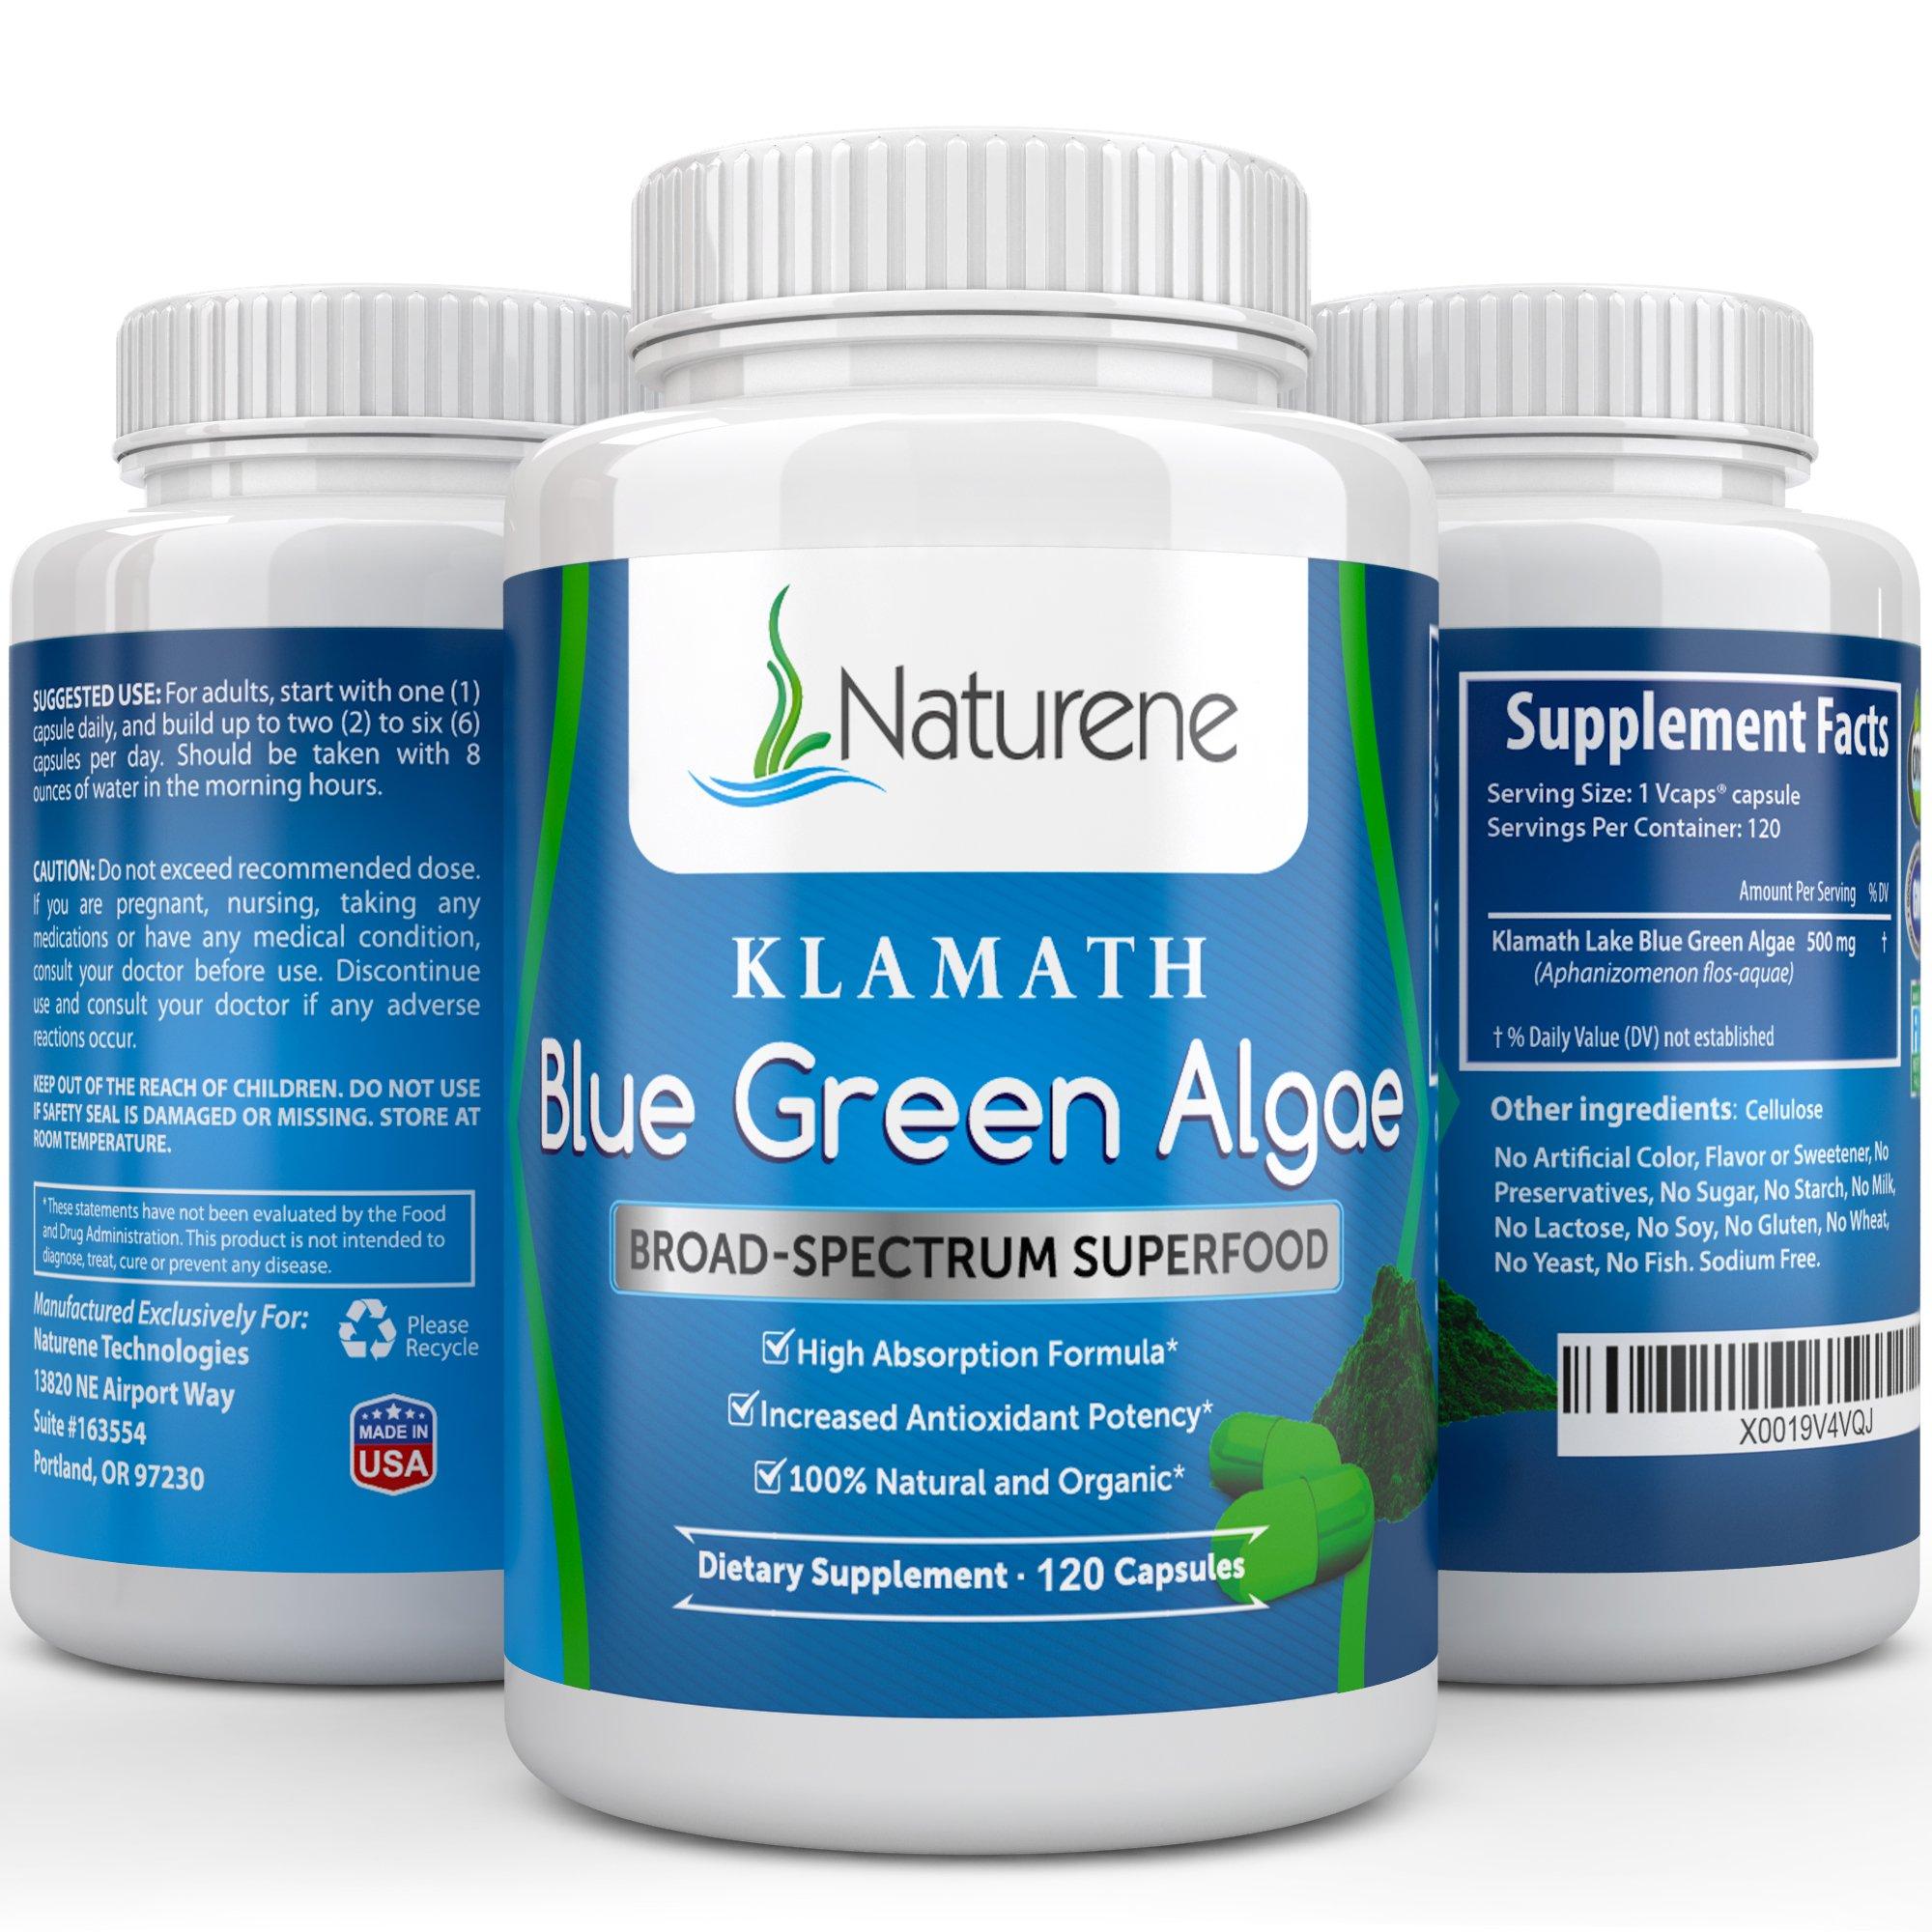 Naturene Organic Klamath Blue Green Algae, 500mg, 120 vegan capsules - Energy and Focus Superfood with More Potency Than Spirulina or Chlorella - High Absorption Formula - Certified USDA Organic